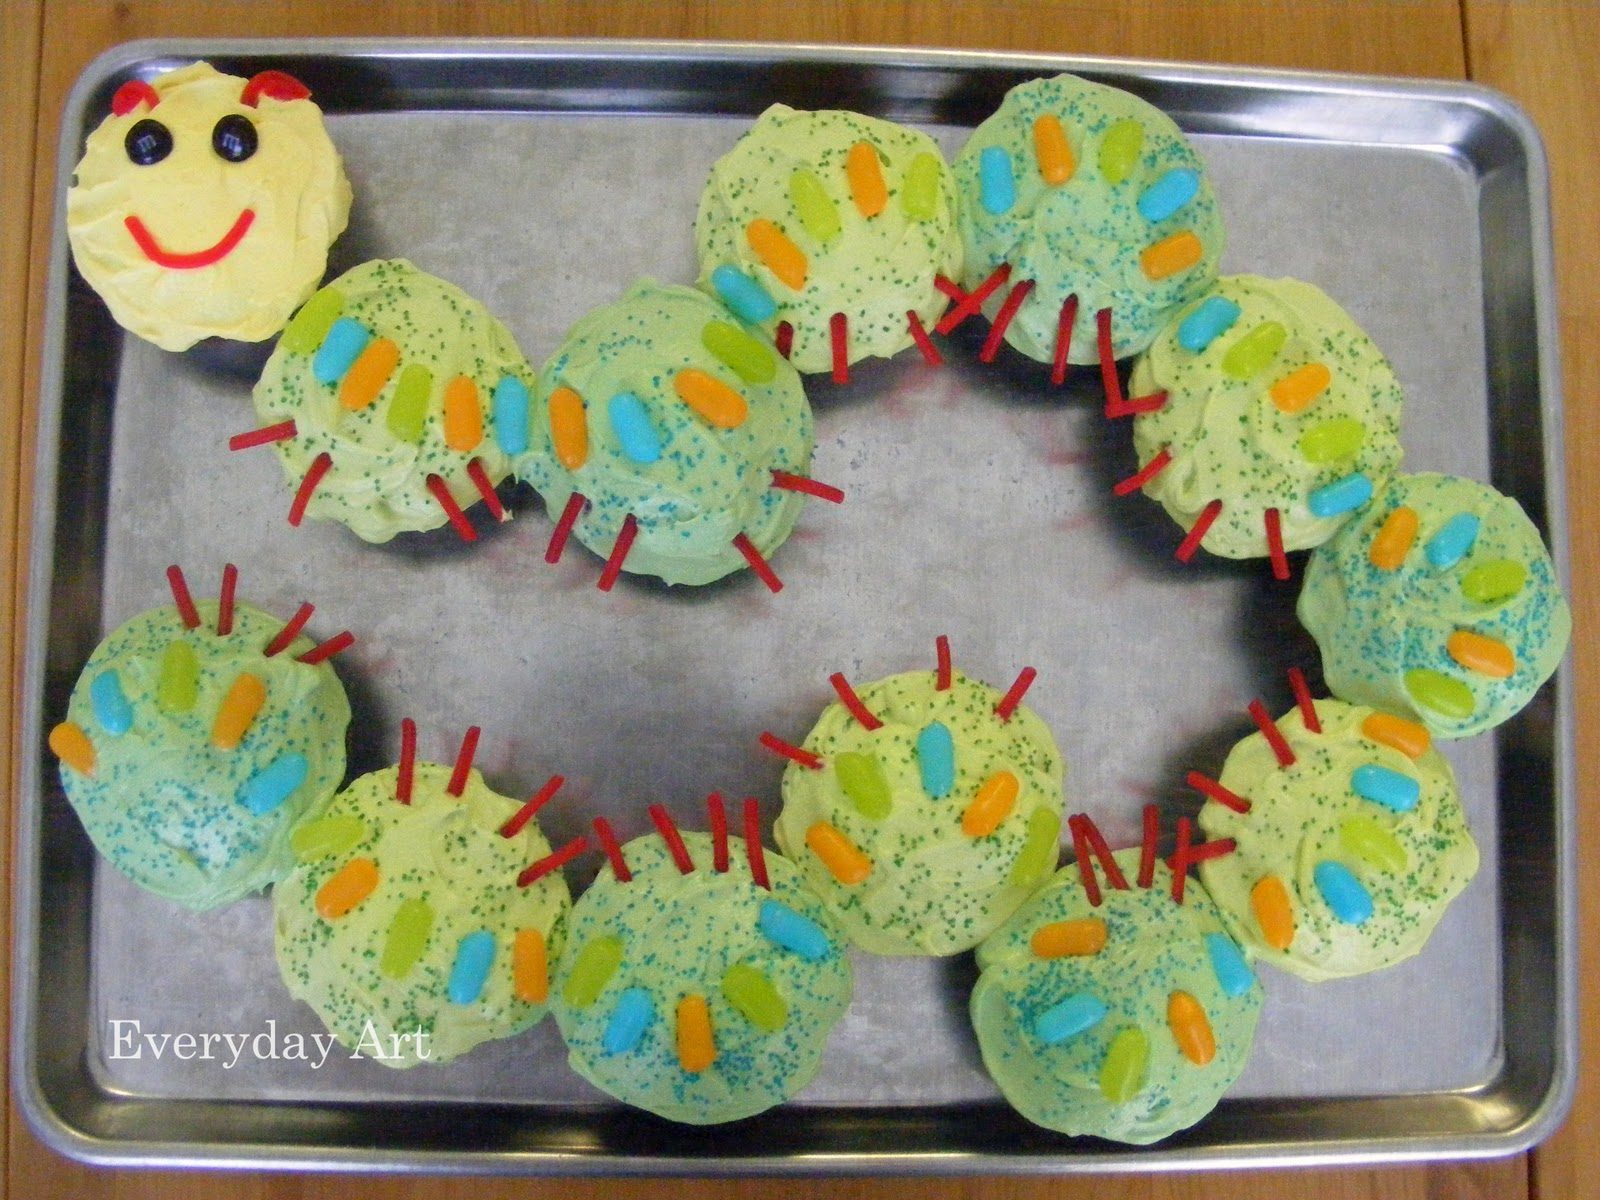 Everyday Art Caterpillar Birthday Cake